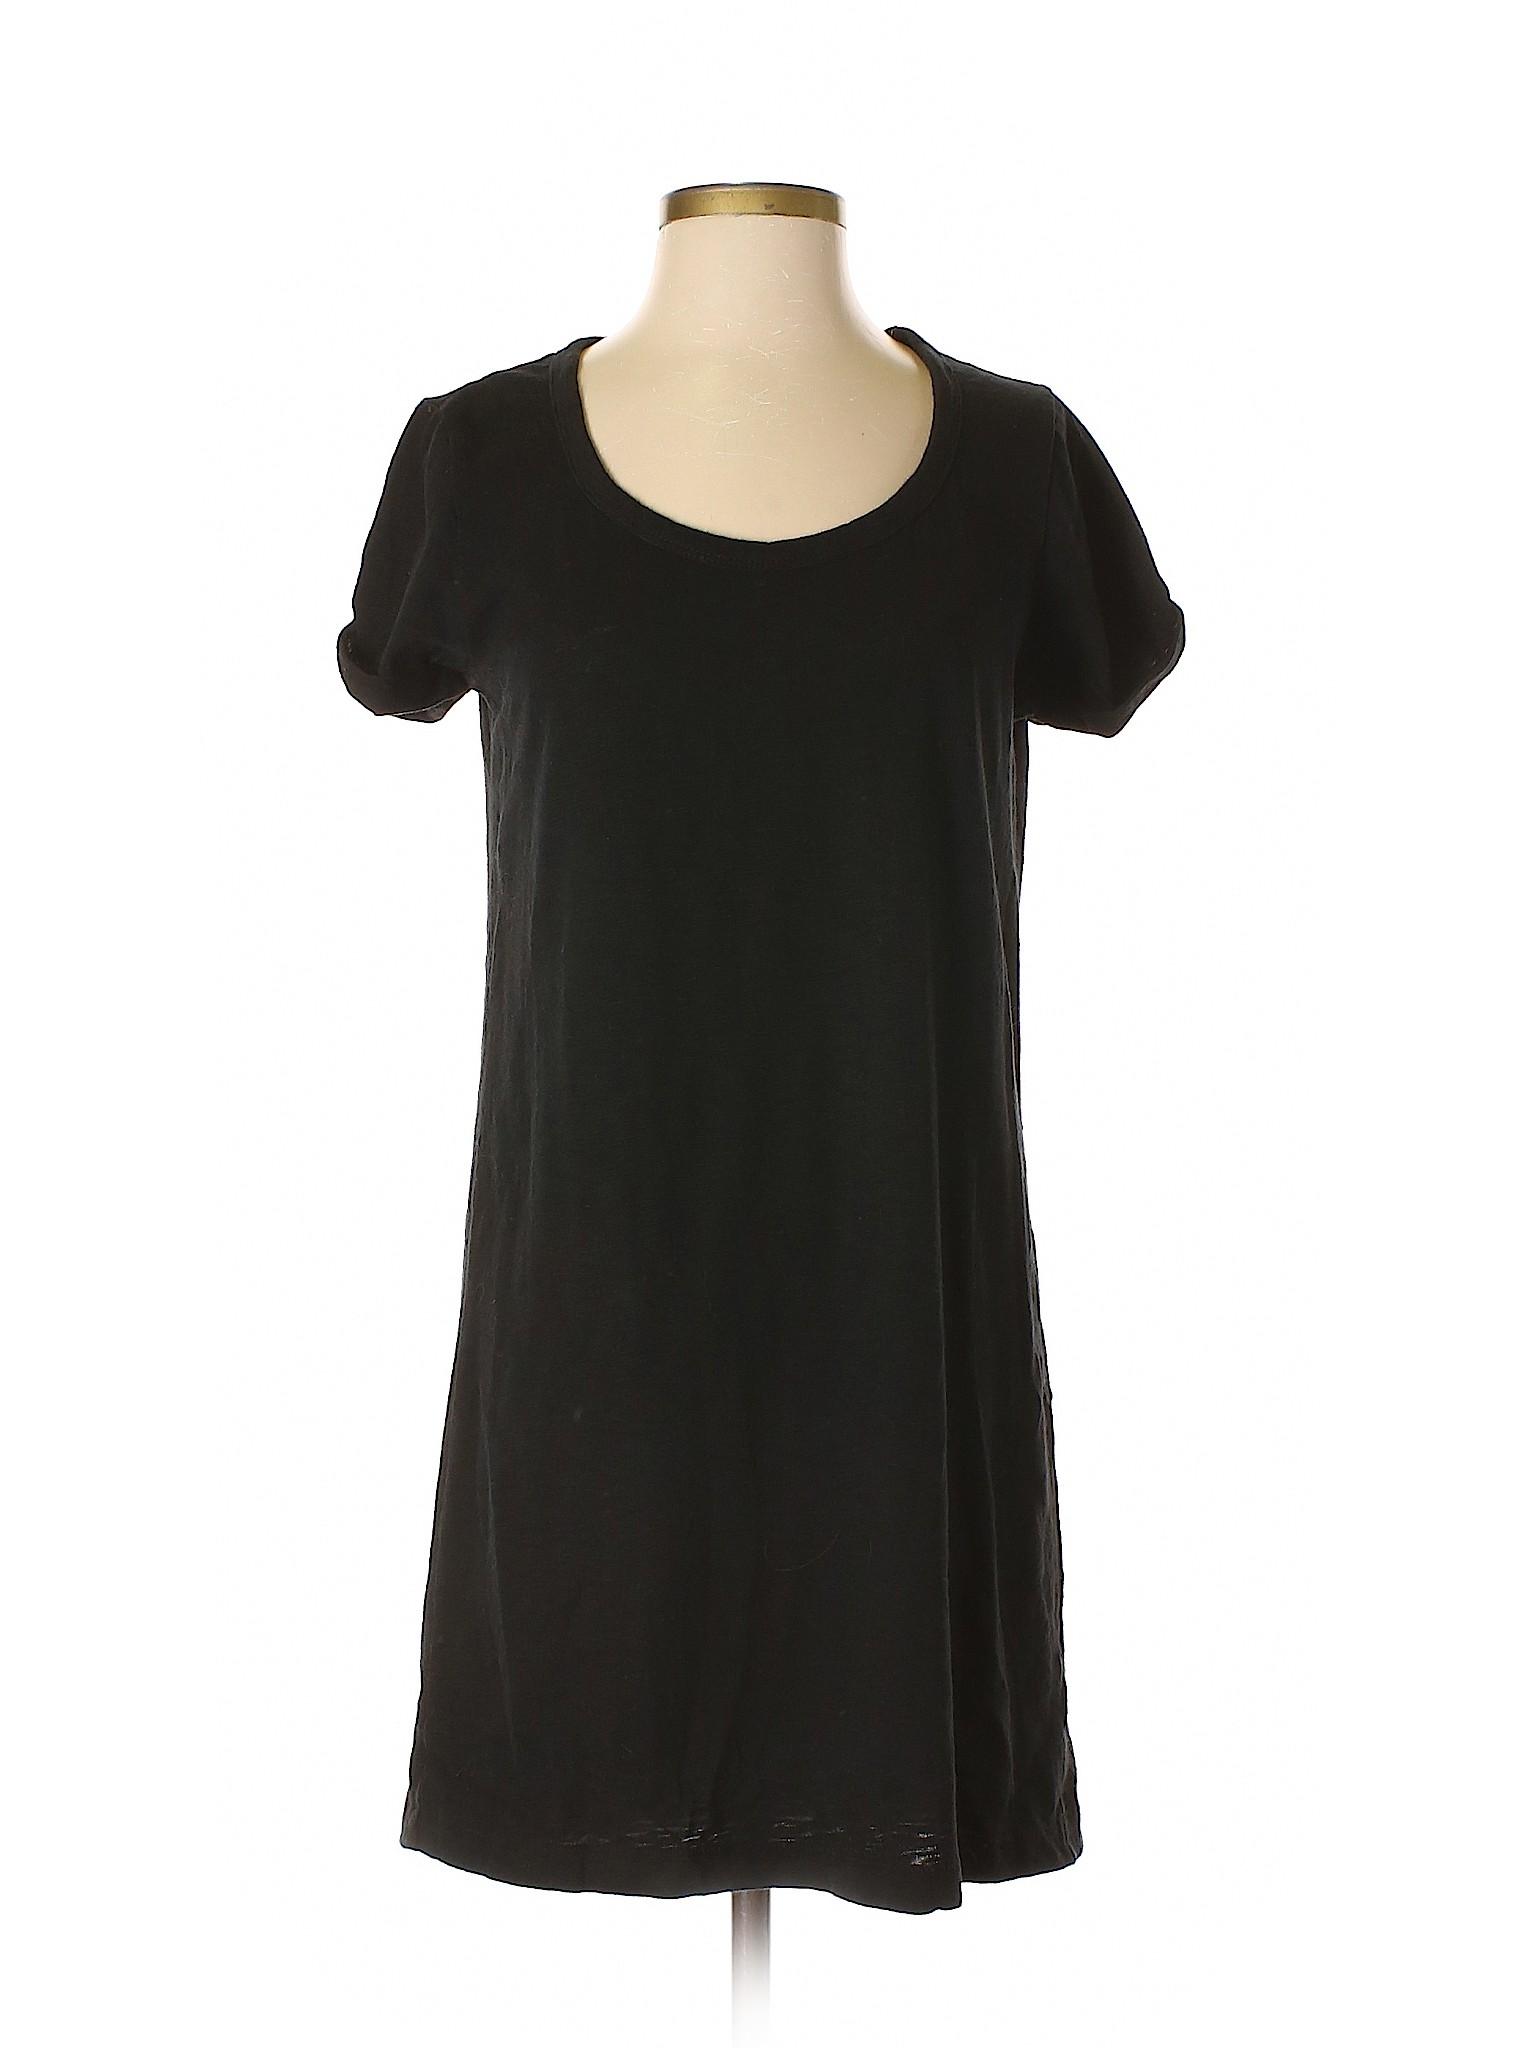 Selling Casual Casual Gap Selling Dress Gap Selling Dress Gap Casual SxqX4pp